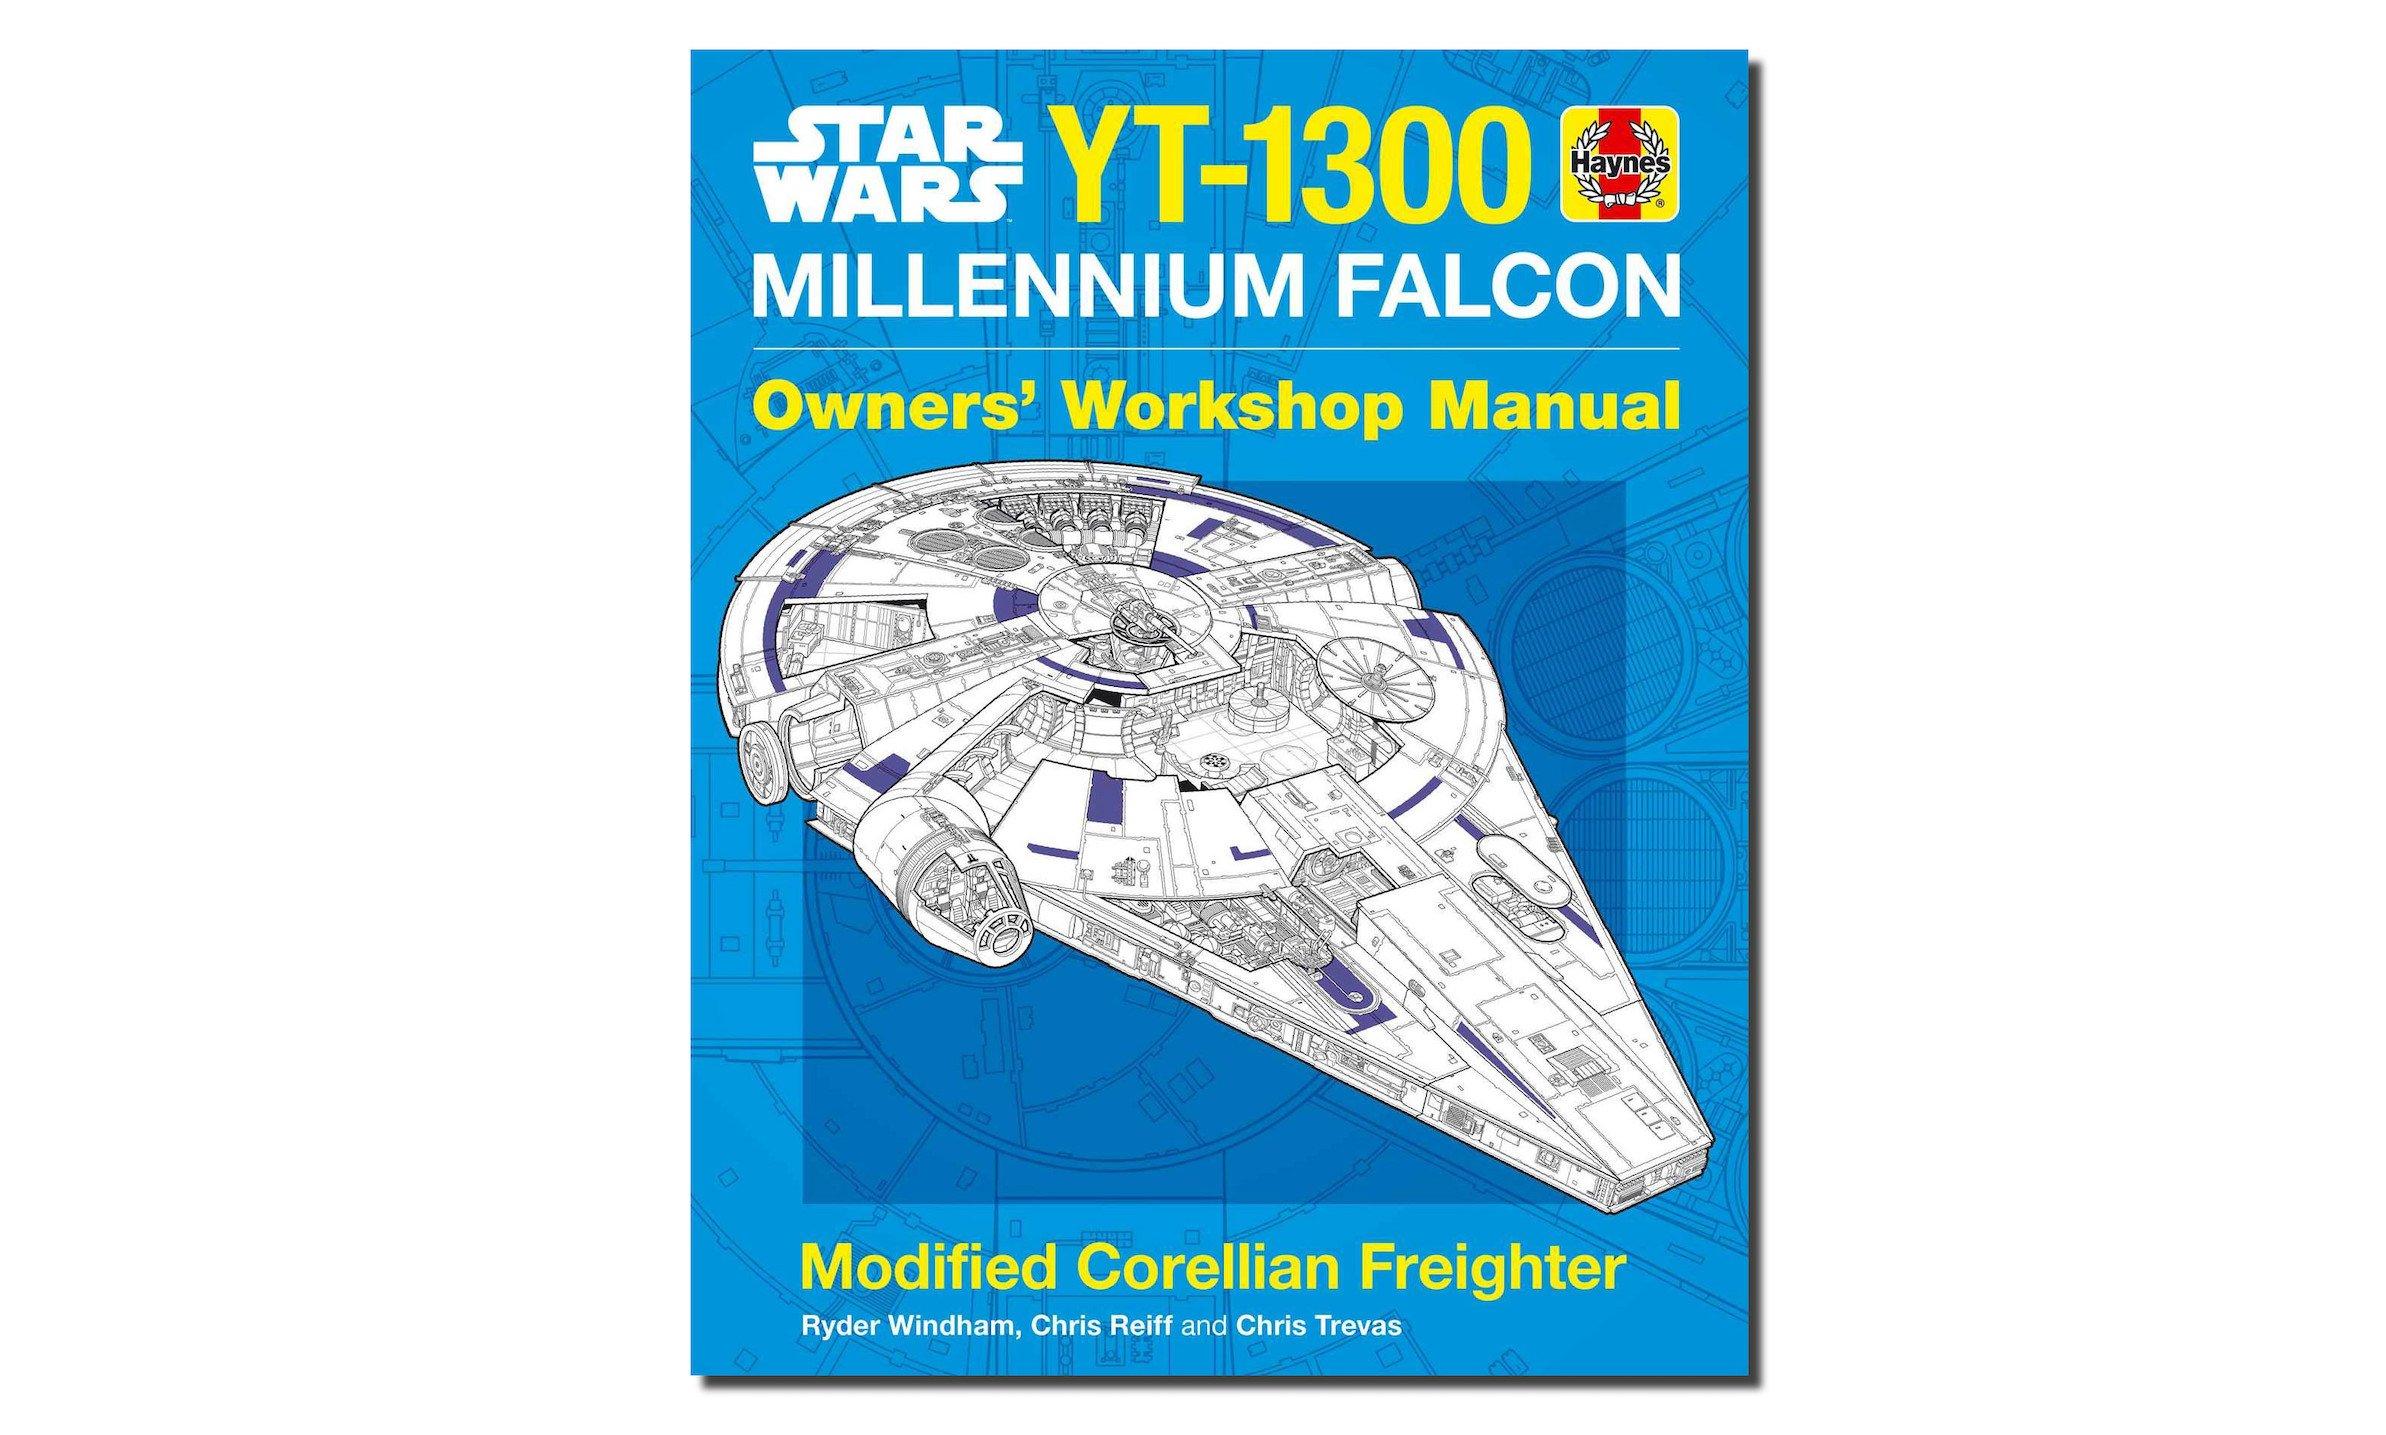 Millennium Falcon - Owners' Workshop Manual